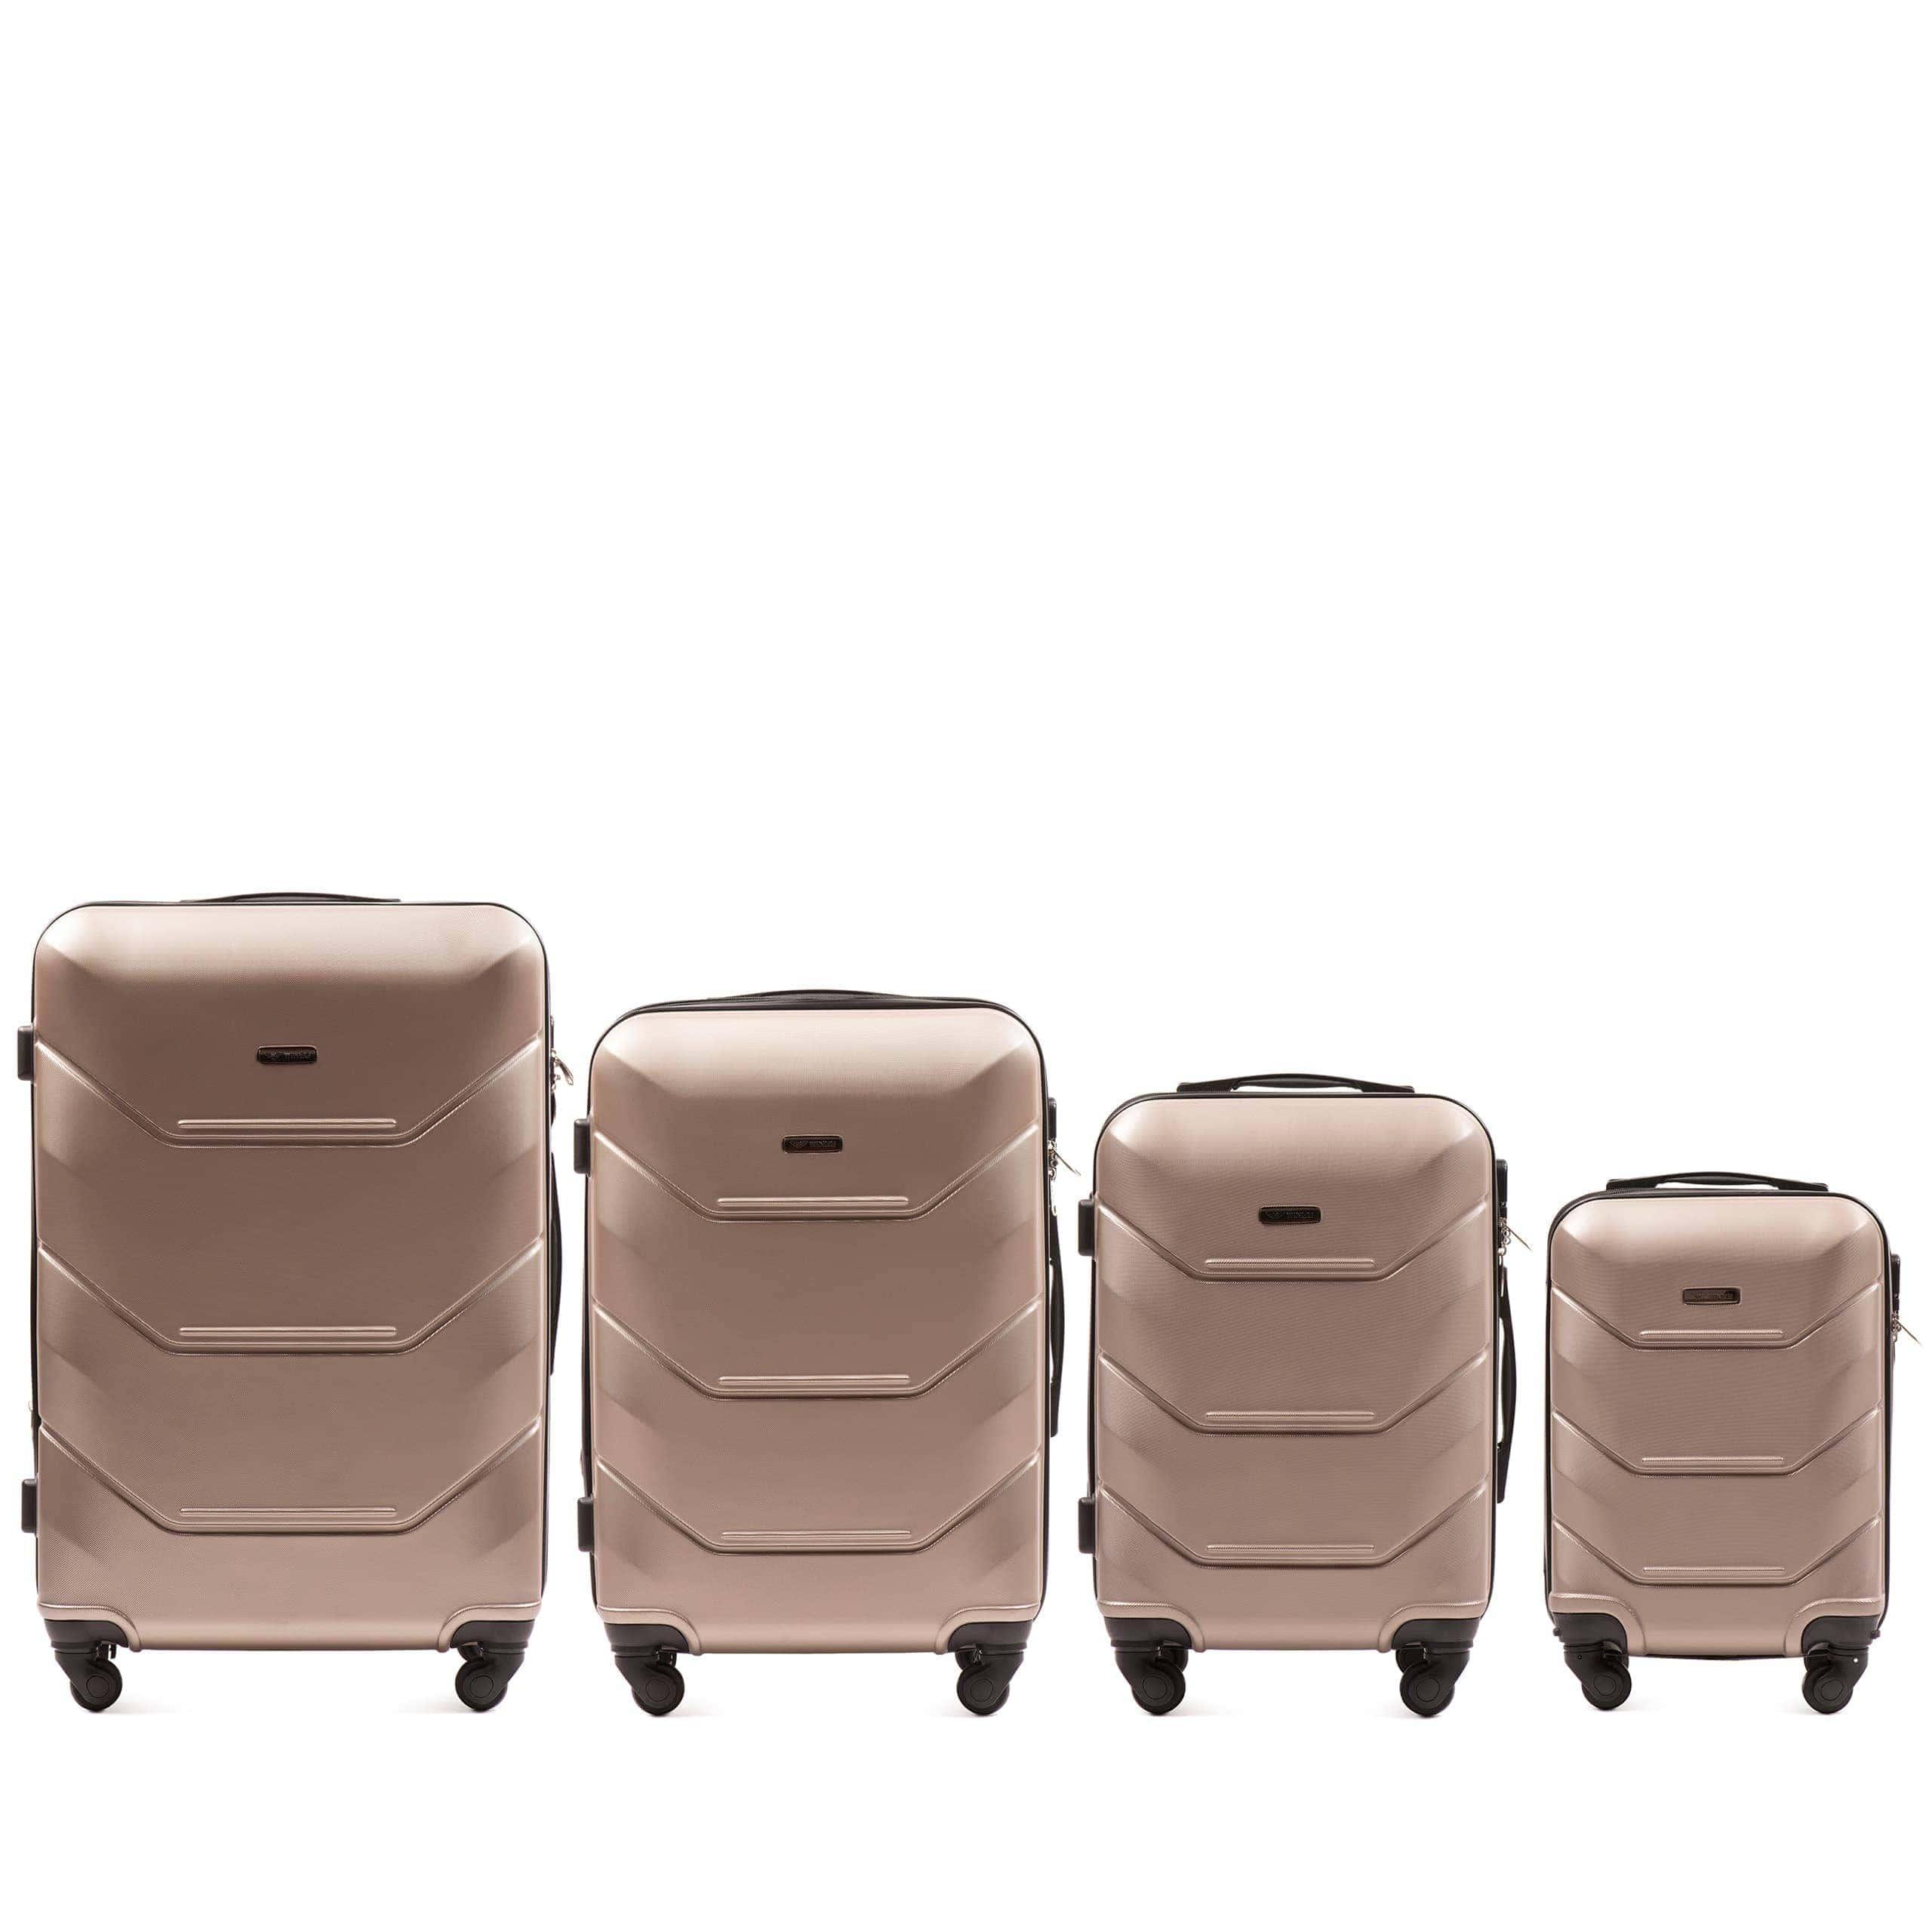 Set de valize din ABS Policarbonat pe 4 roti! Rezistente si usoare! 147 SET CHAMPANGE